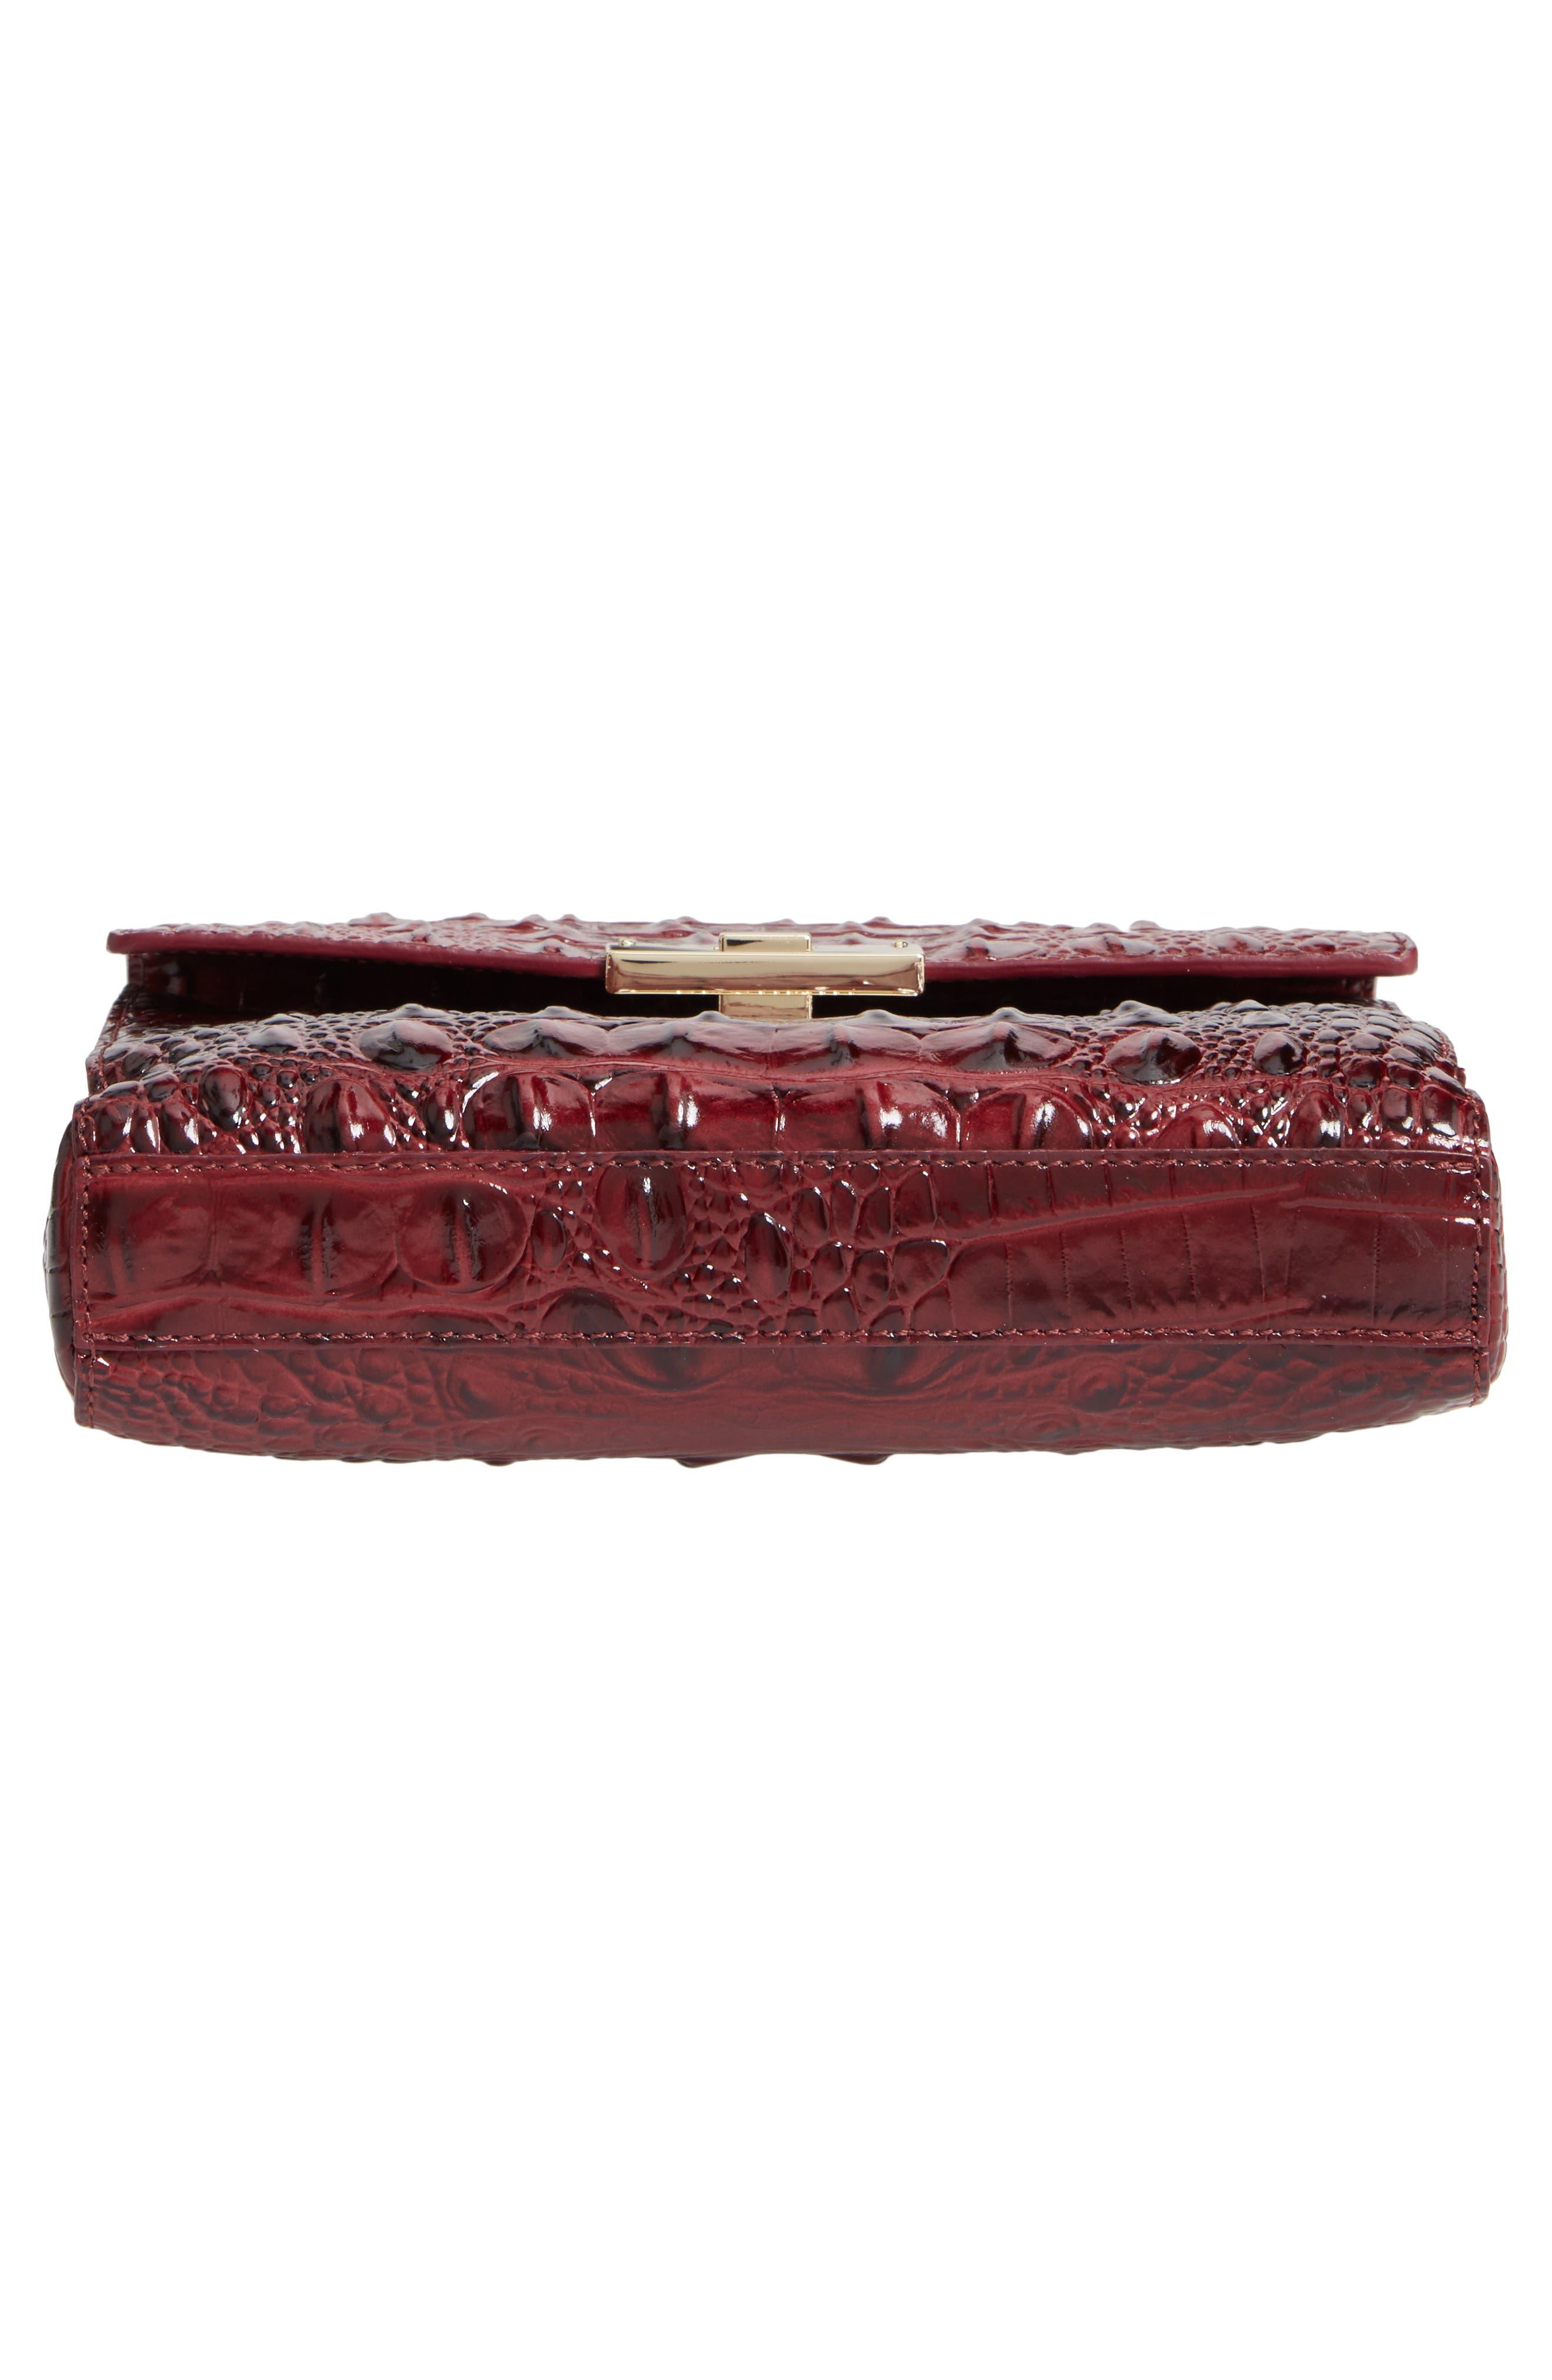 Melbourne Manhattan Croc Embossed Leather Crossbody Bag,                             Alternate thumbnail 5, color,                             Tart